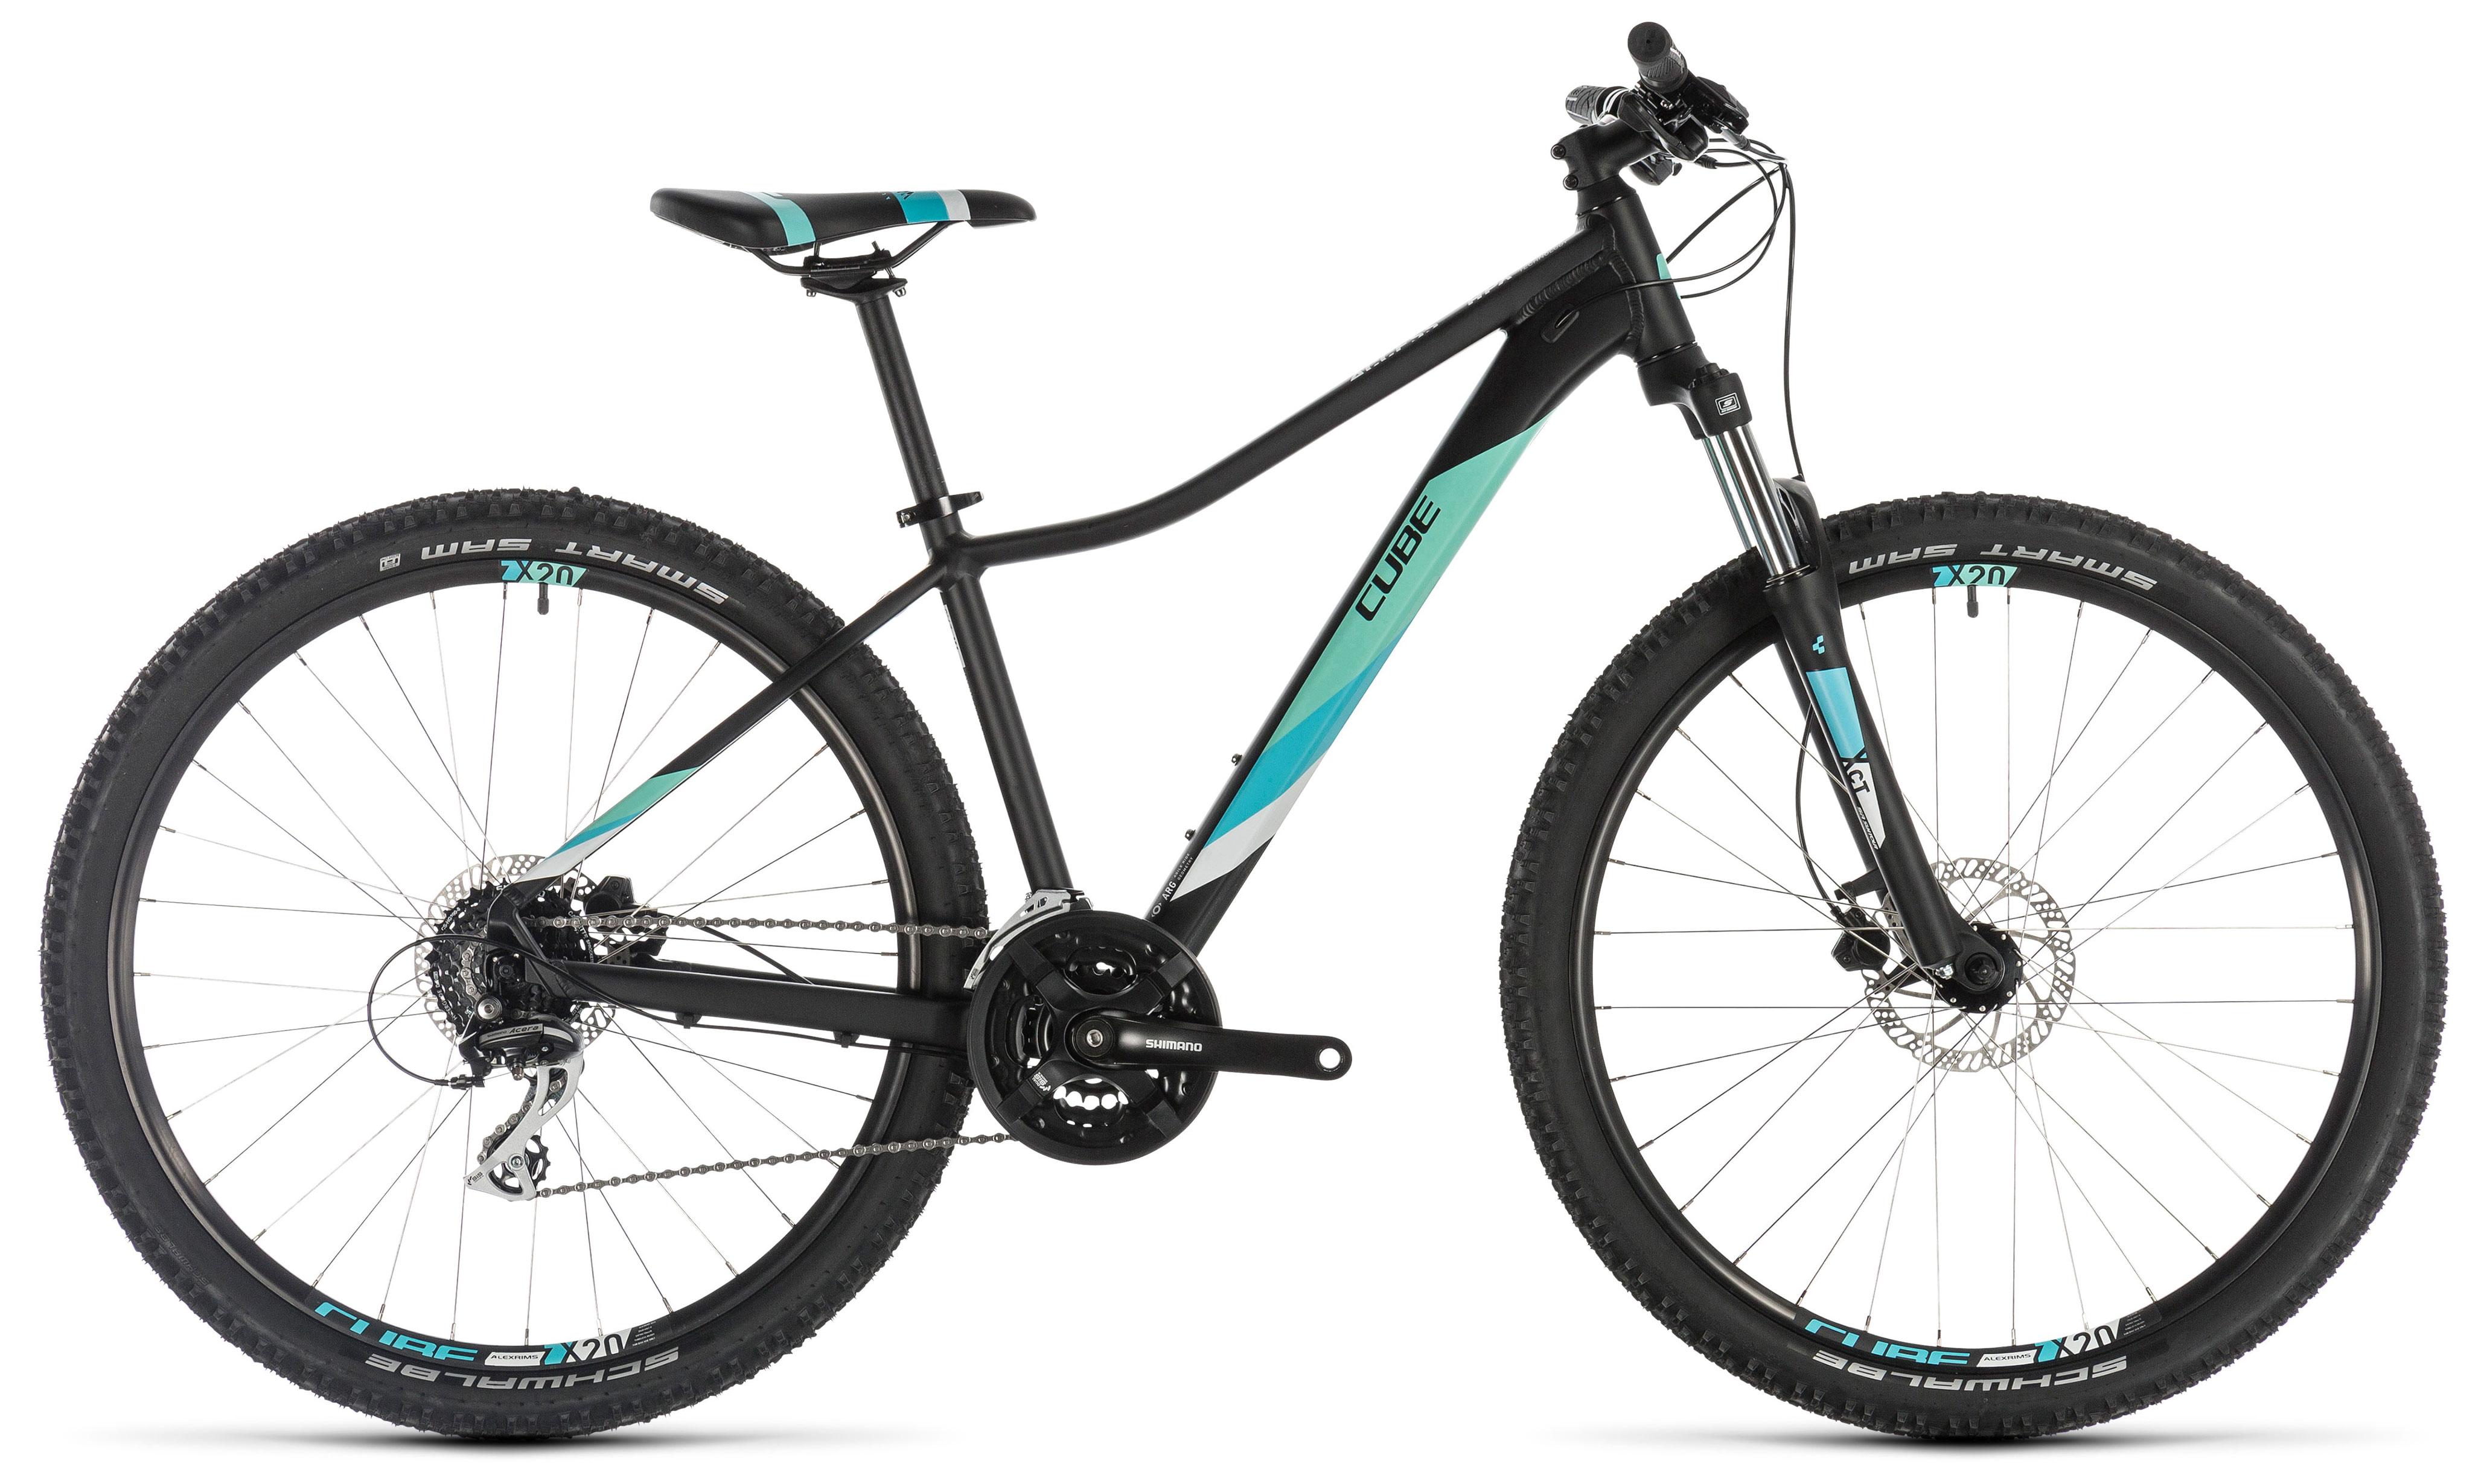 Велосипед Cube Access WS EAZ 27.5 2019 велосипед cube access ws eaz 27 5 2019